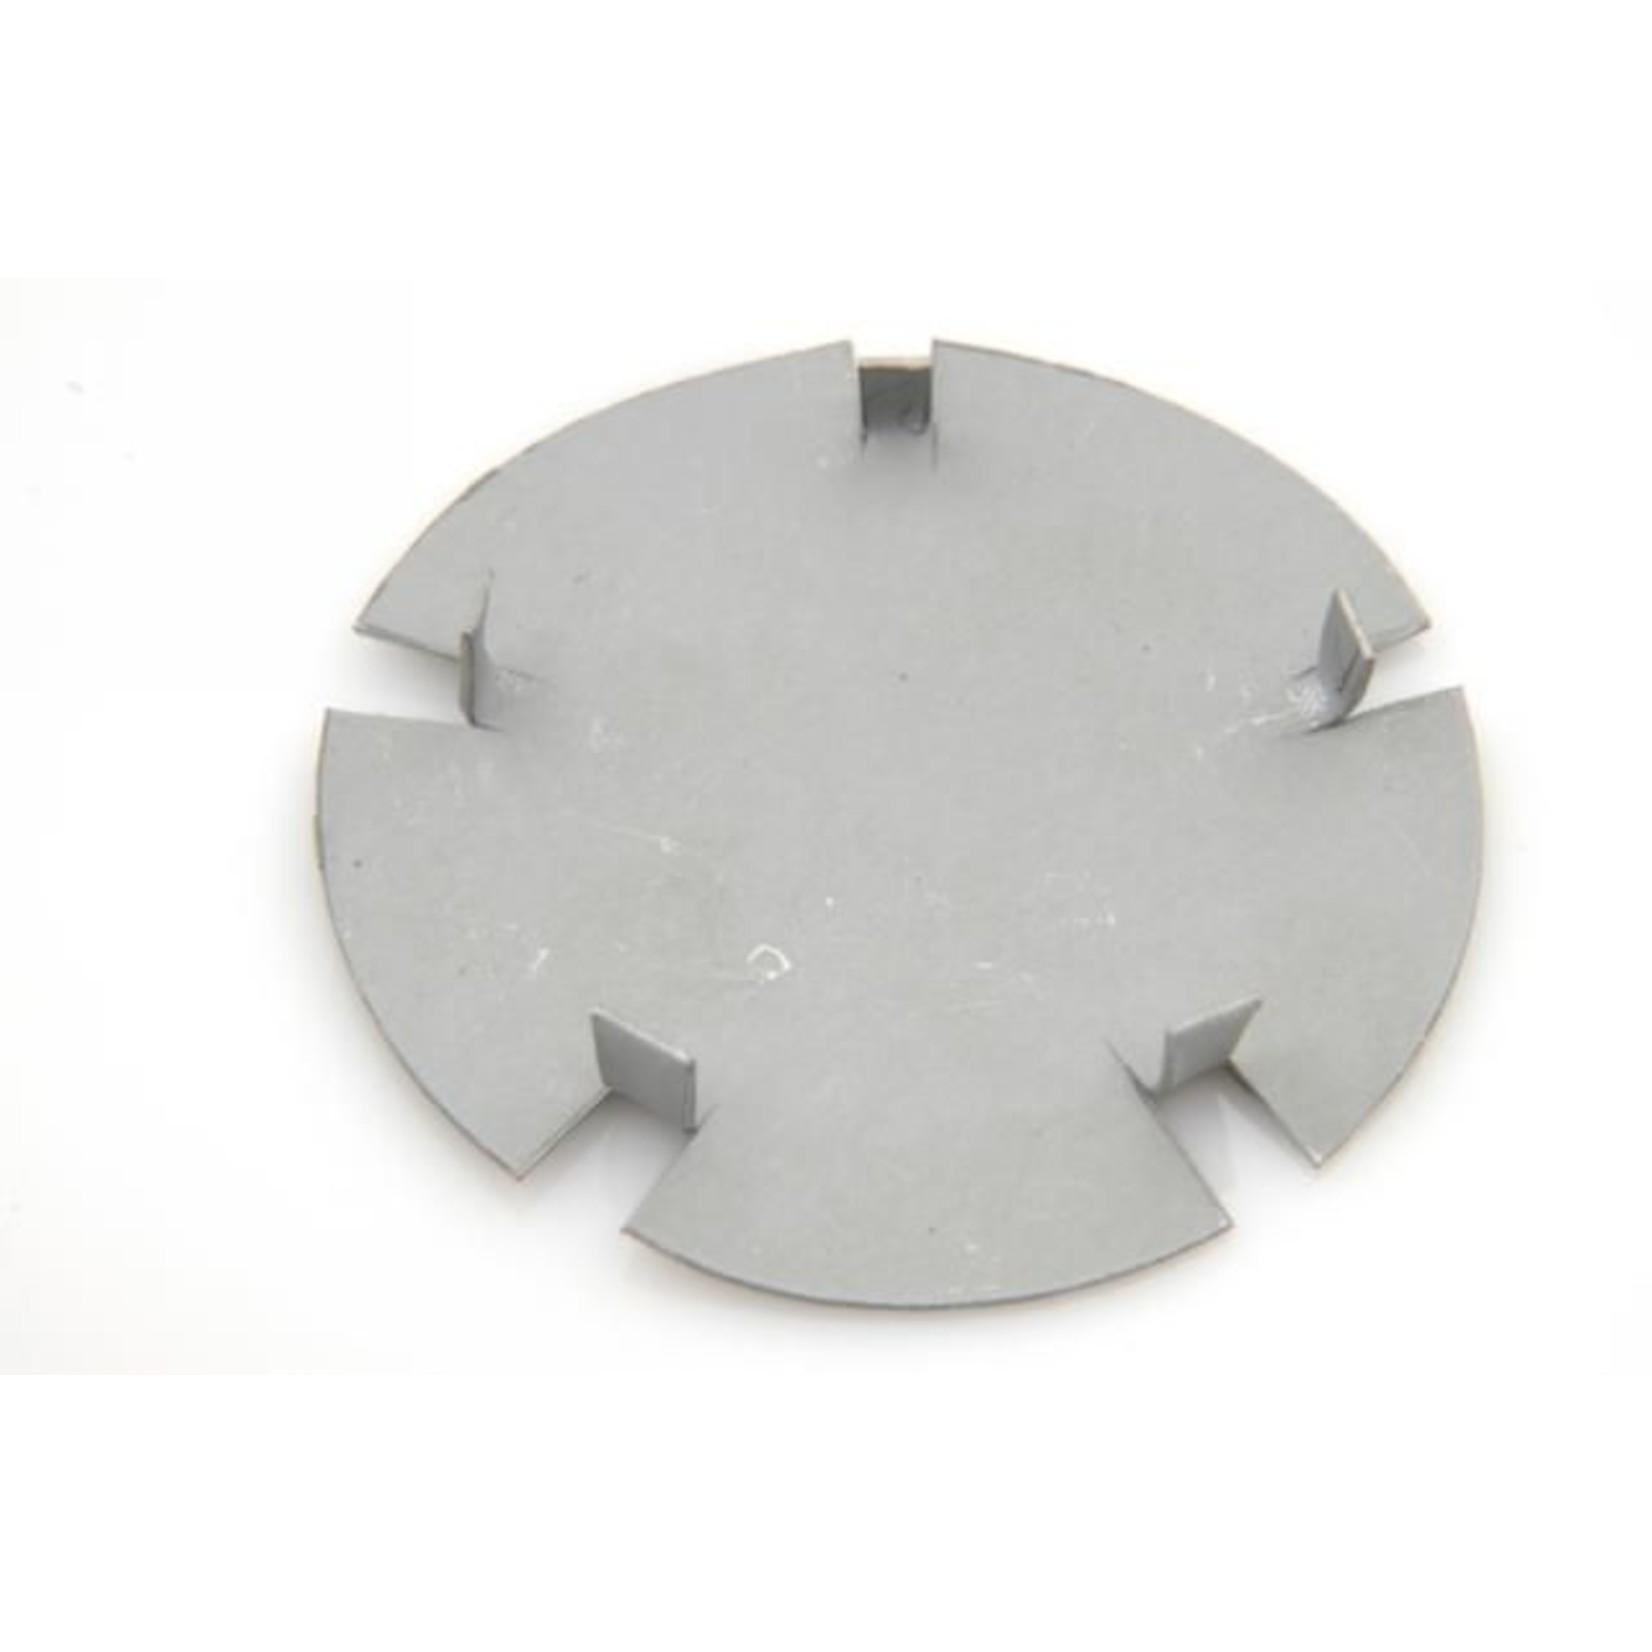 Bodemafdichtdop metaal + kartels Nr Org: DX744126